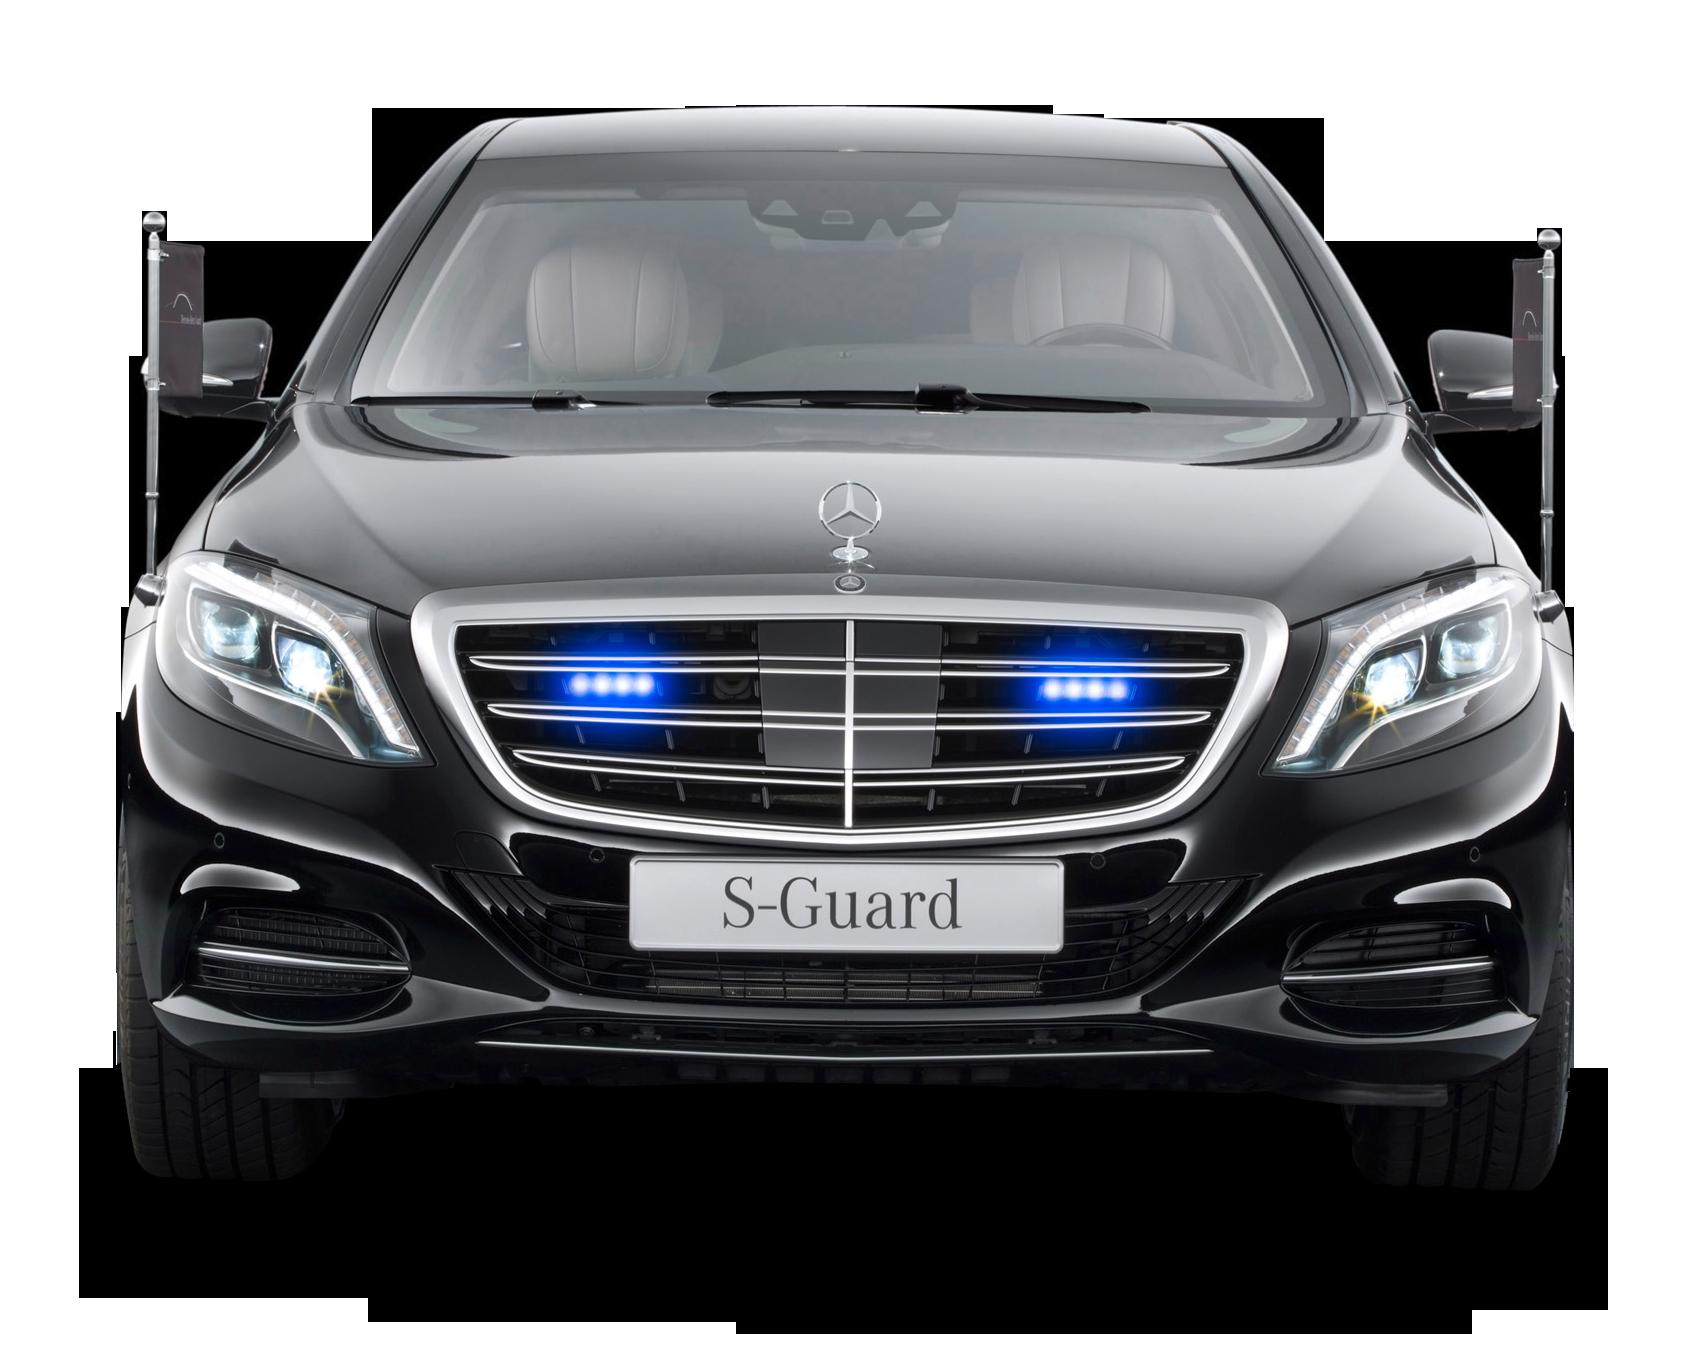 Mercedes Benz S 600 Guard President Black Car PNG Image